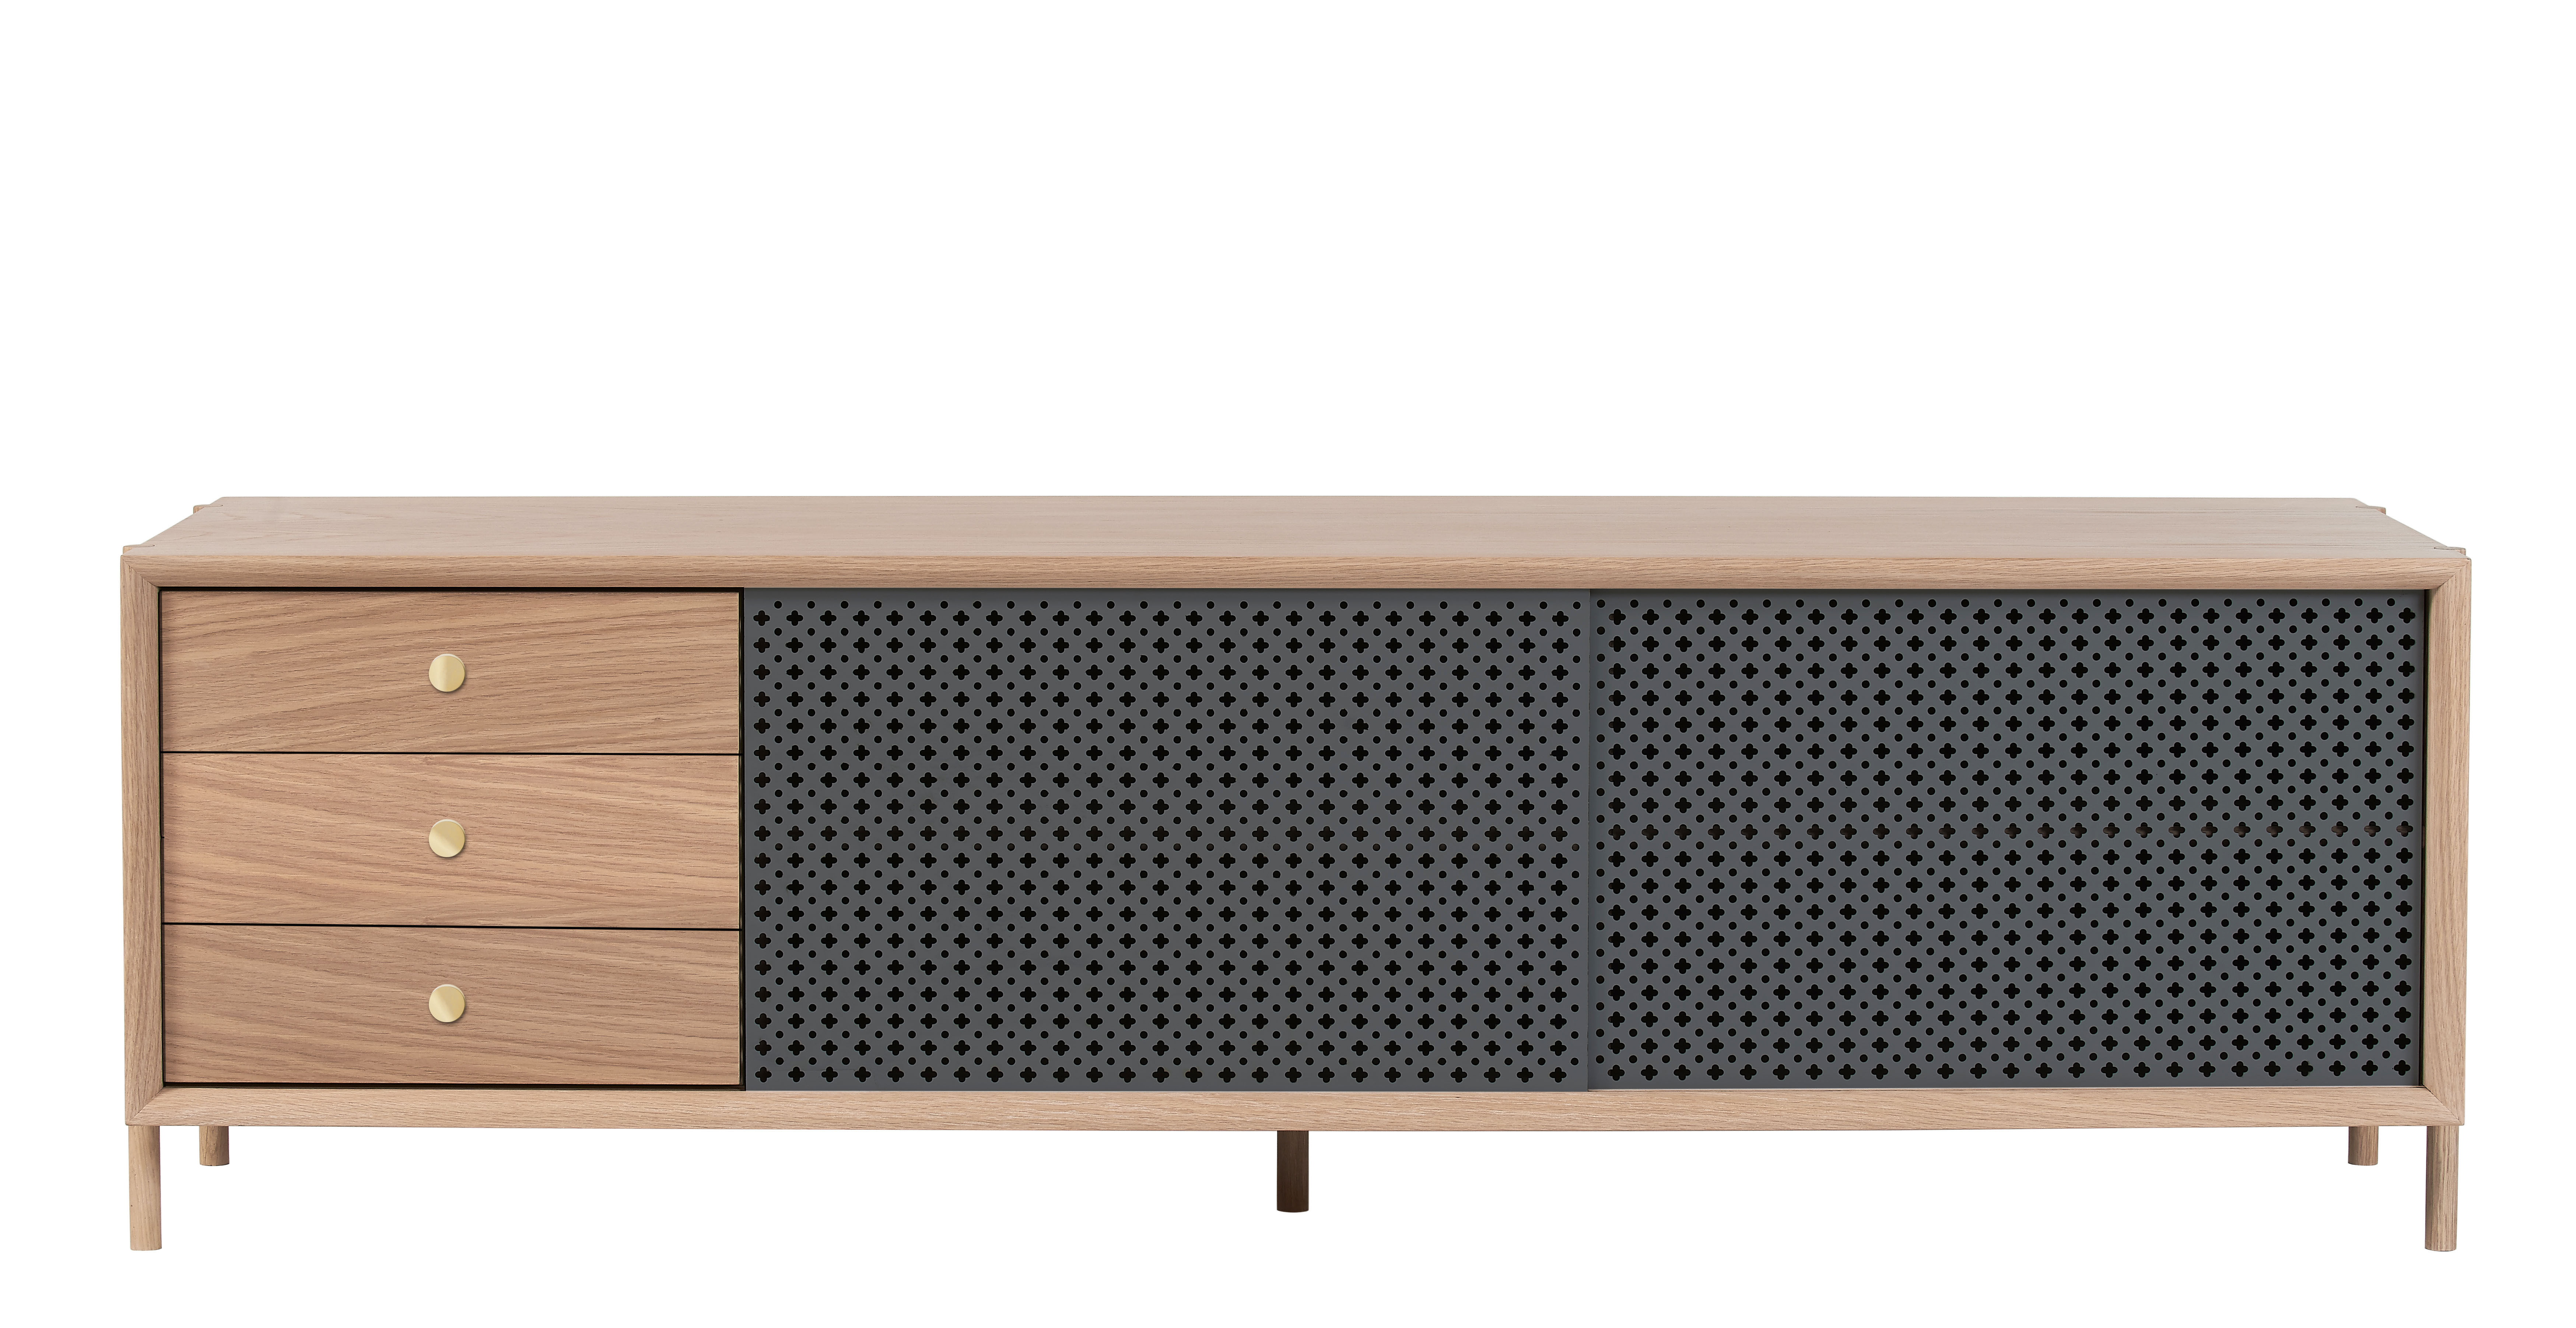 Furniture - Dressers & Storage Units - Gabin Dresser - 3 drawers / L 162 cm - Oak & metal by Hartô - Slate grey & oak - Brass, MDF veneer oak, Perforated metal, Solid oak